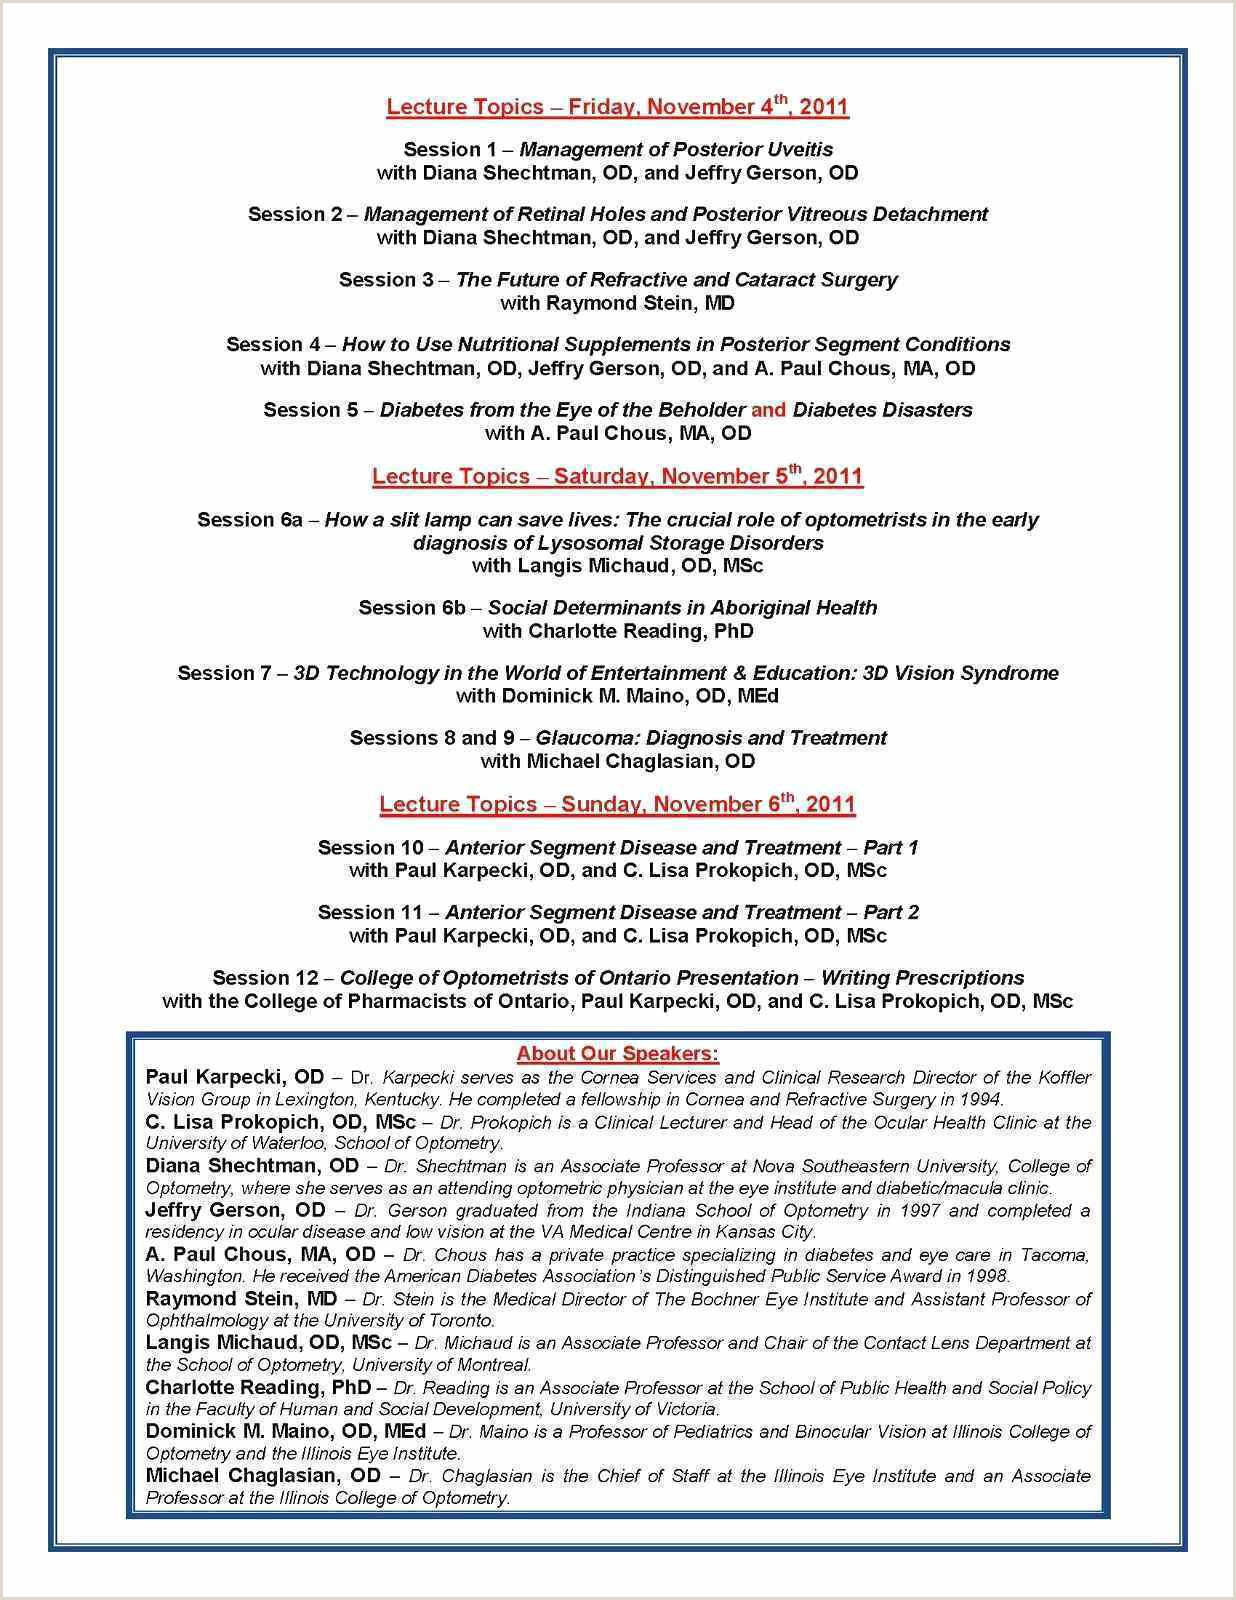 Latest Cv format In Word Cv Gestion Administration échantillon Fresh Latest Cv